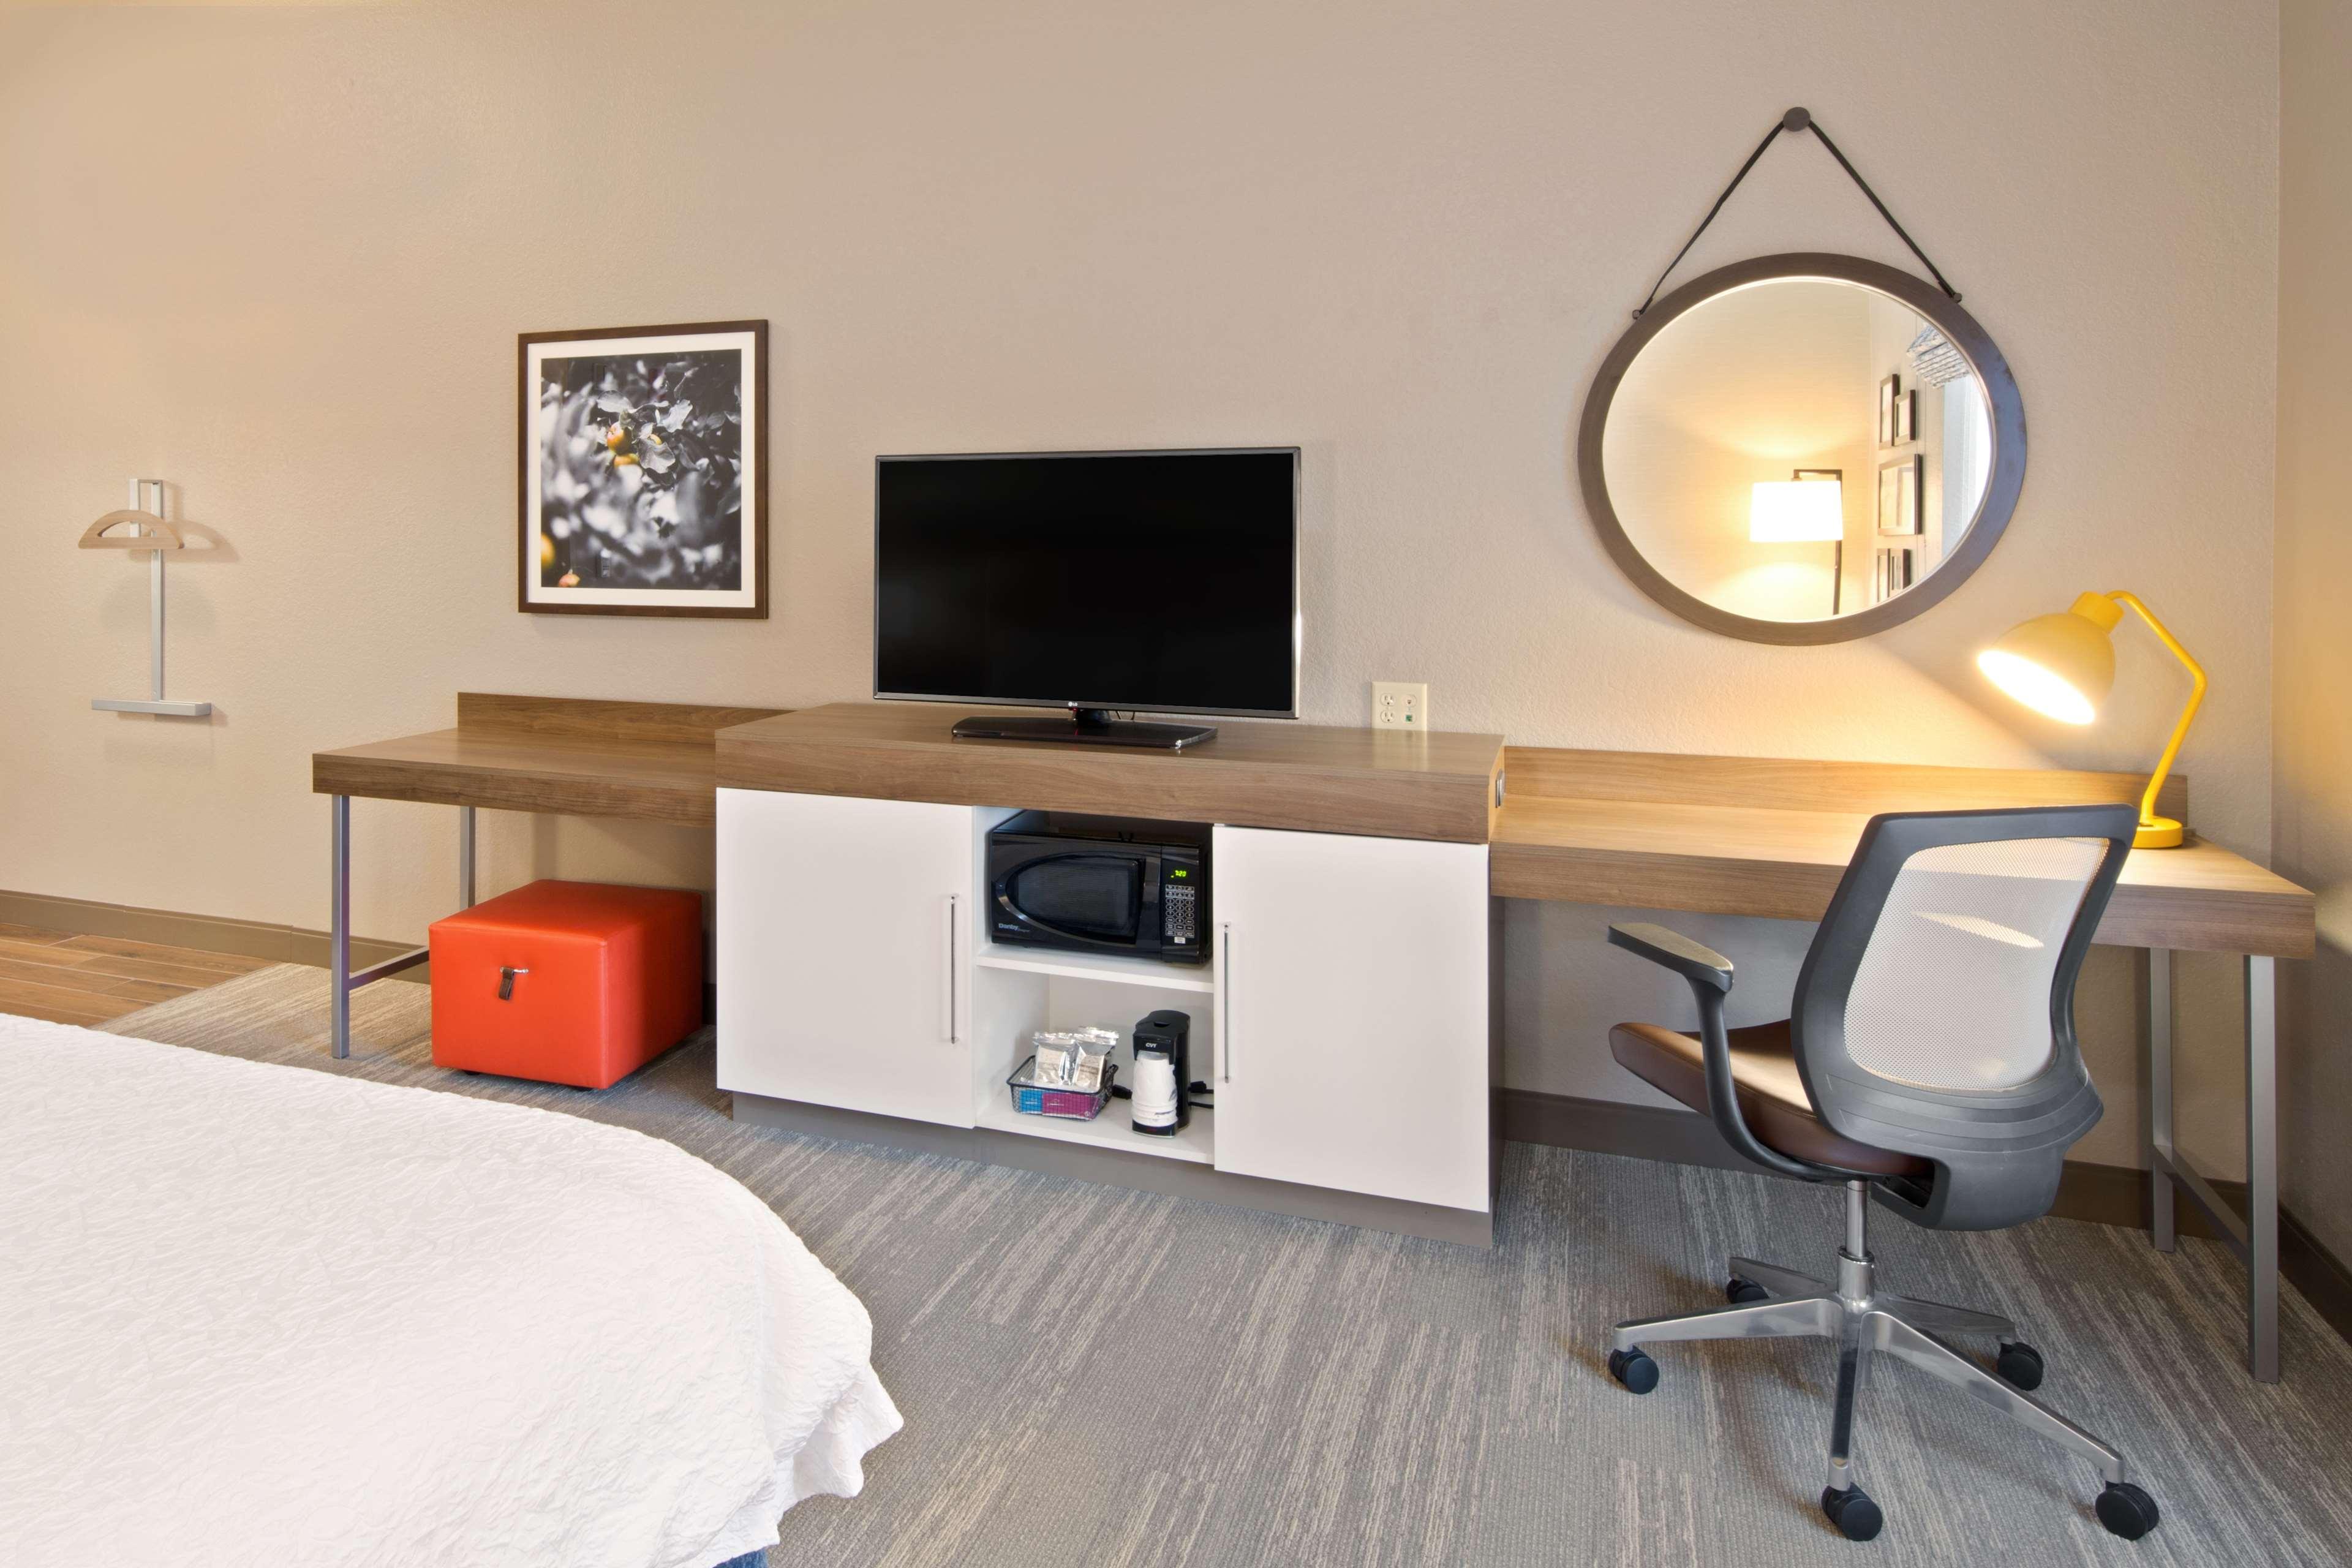 Hampton Inn & Suites Spokane Valley image 16